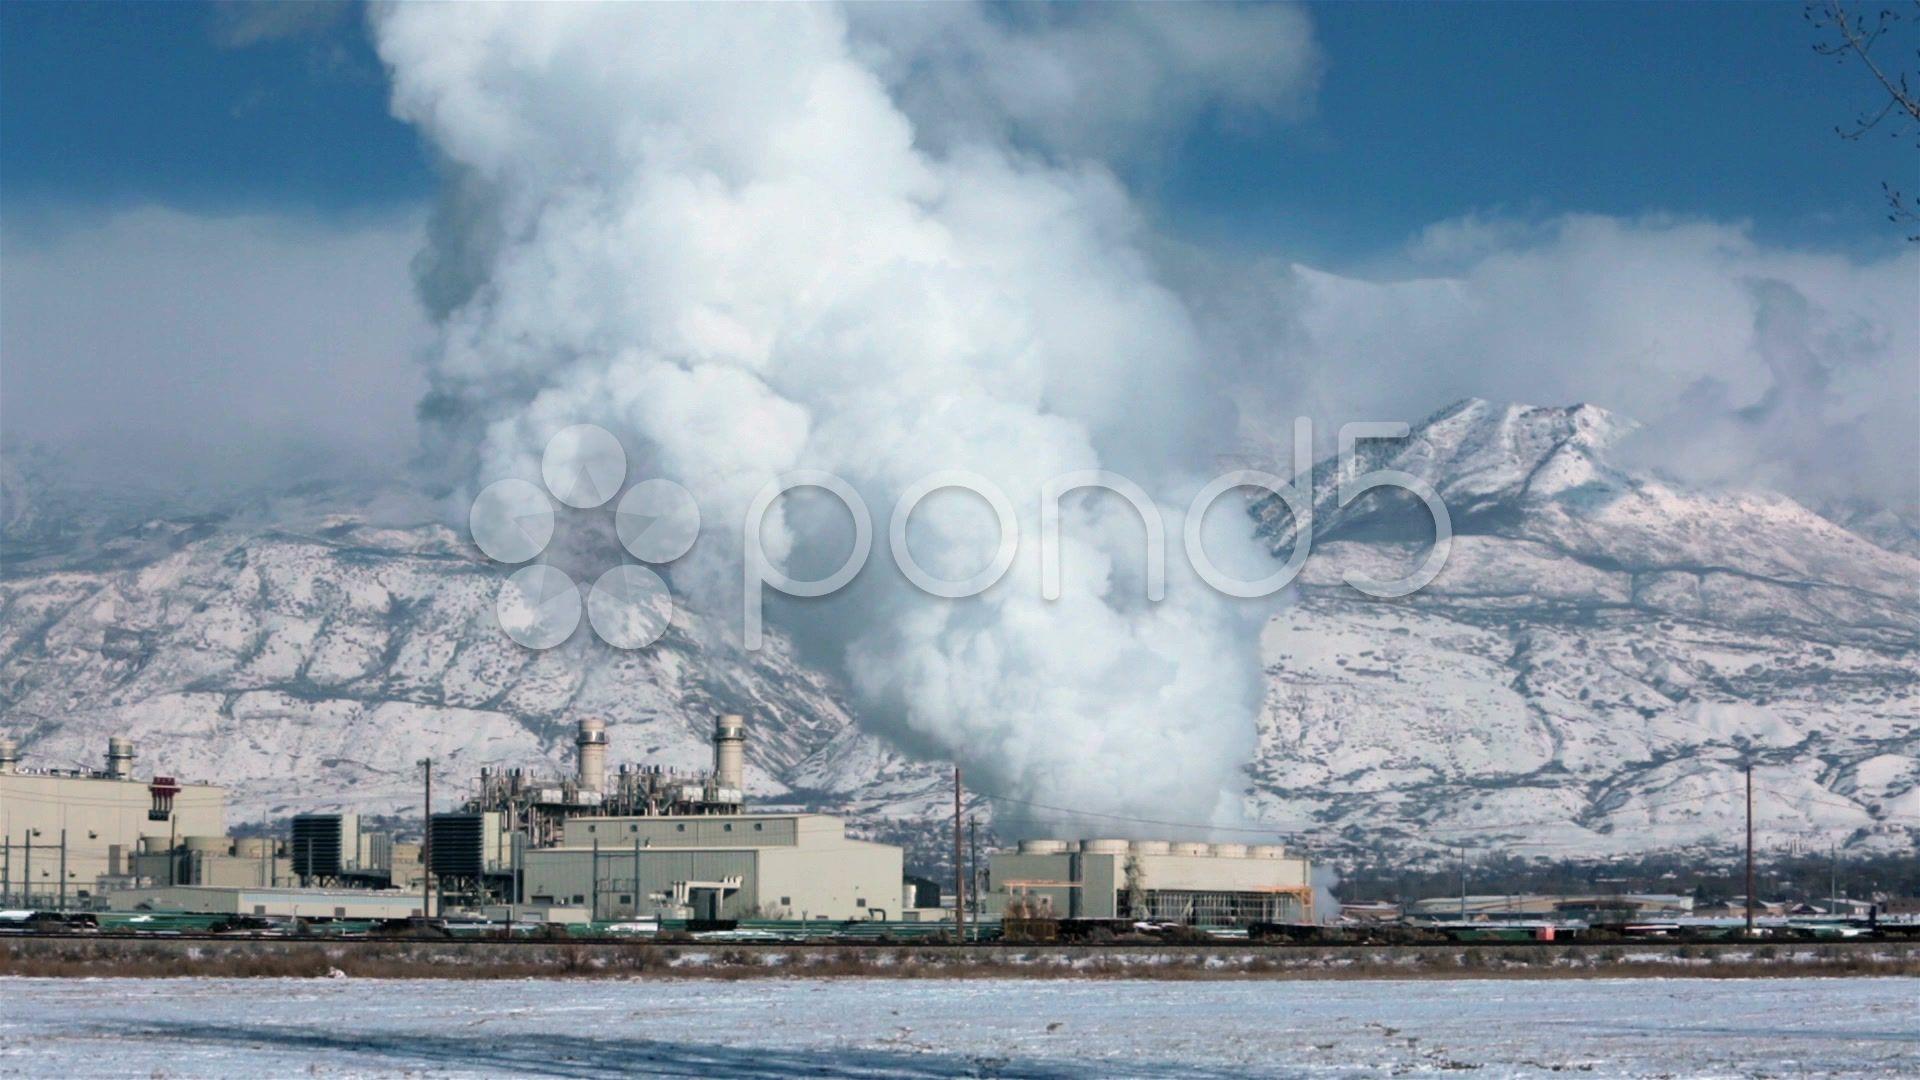 Power Plant Winter Snow Natural Gas Steam Smoke Hd 0190 Stock